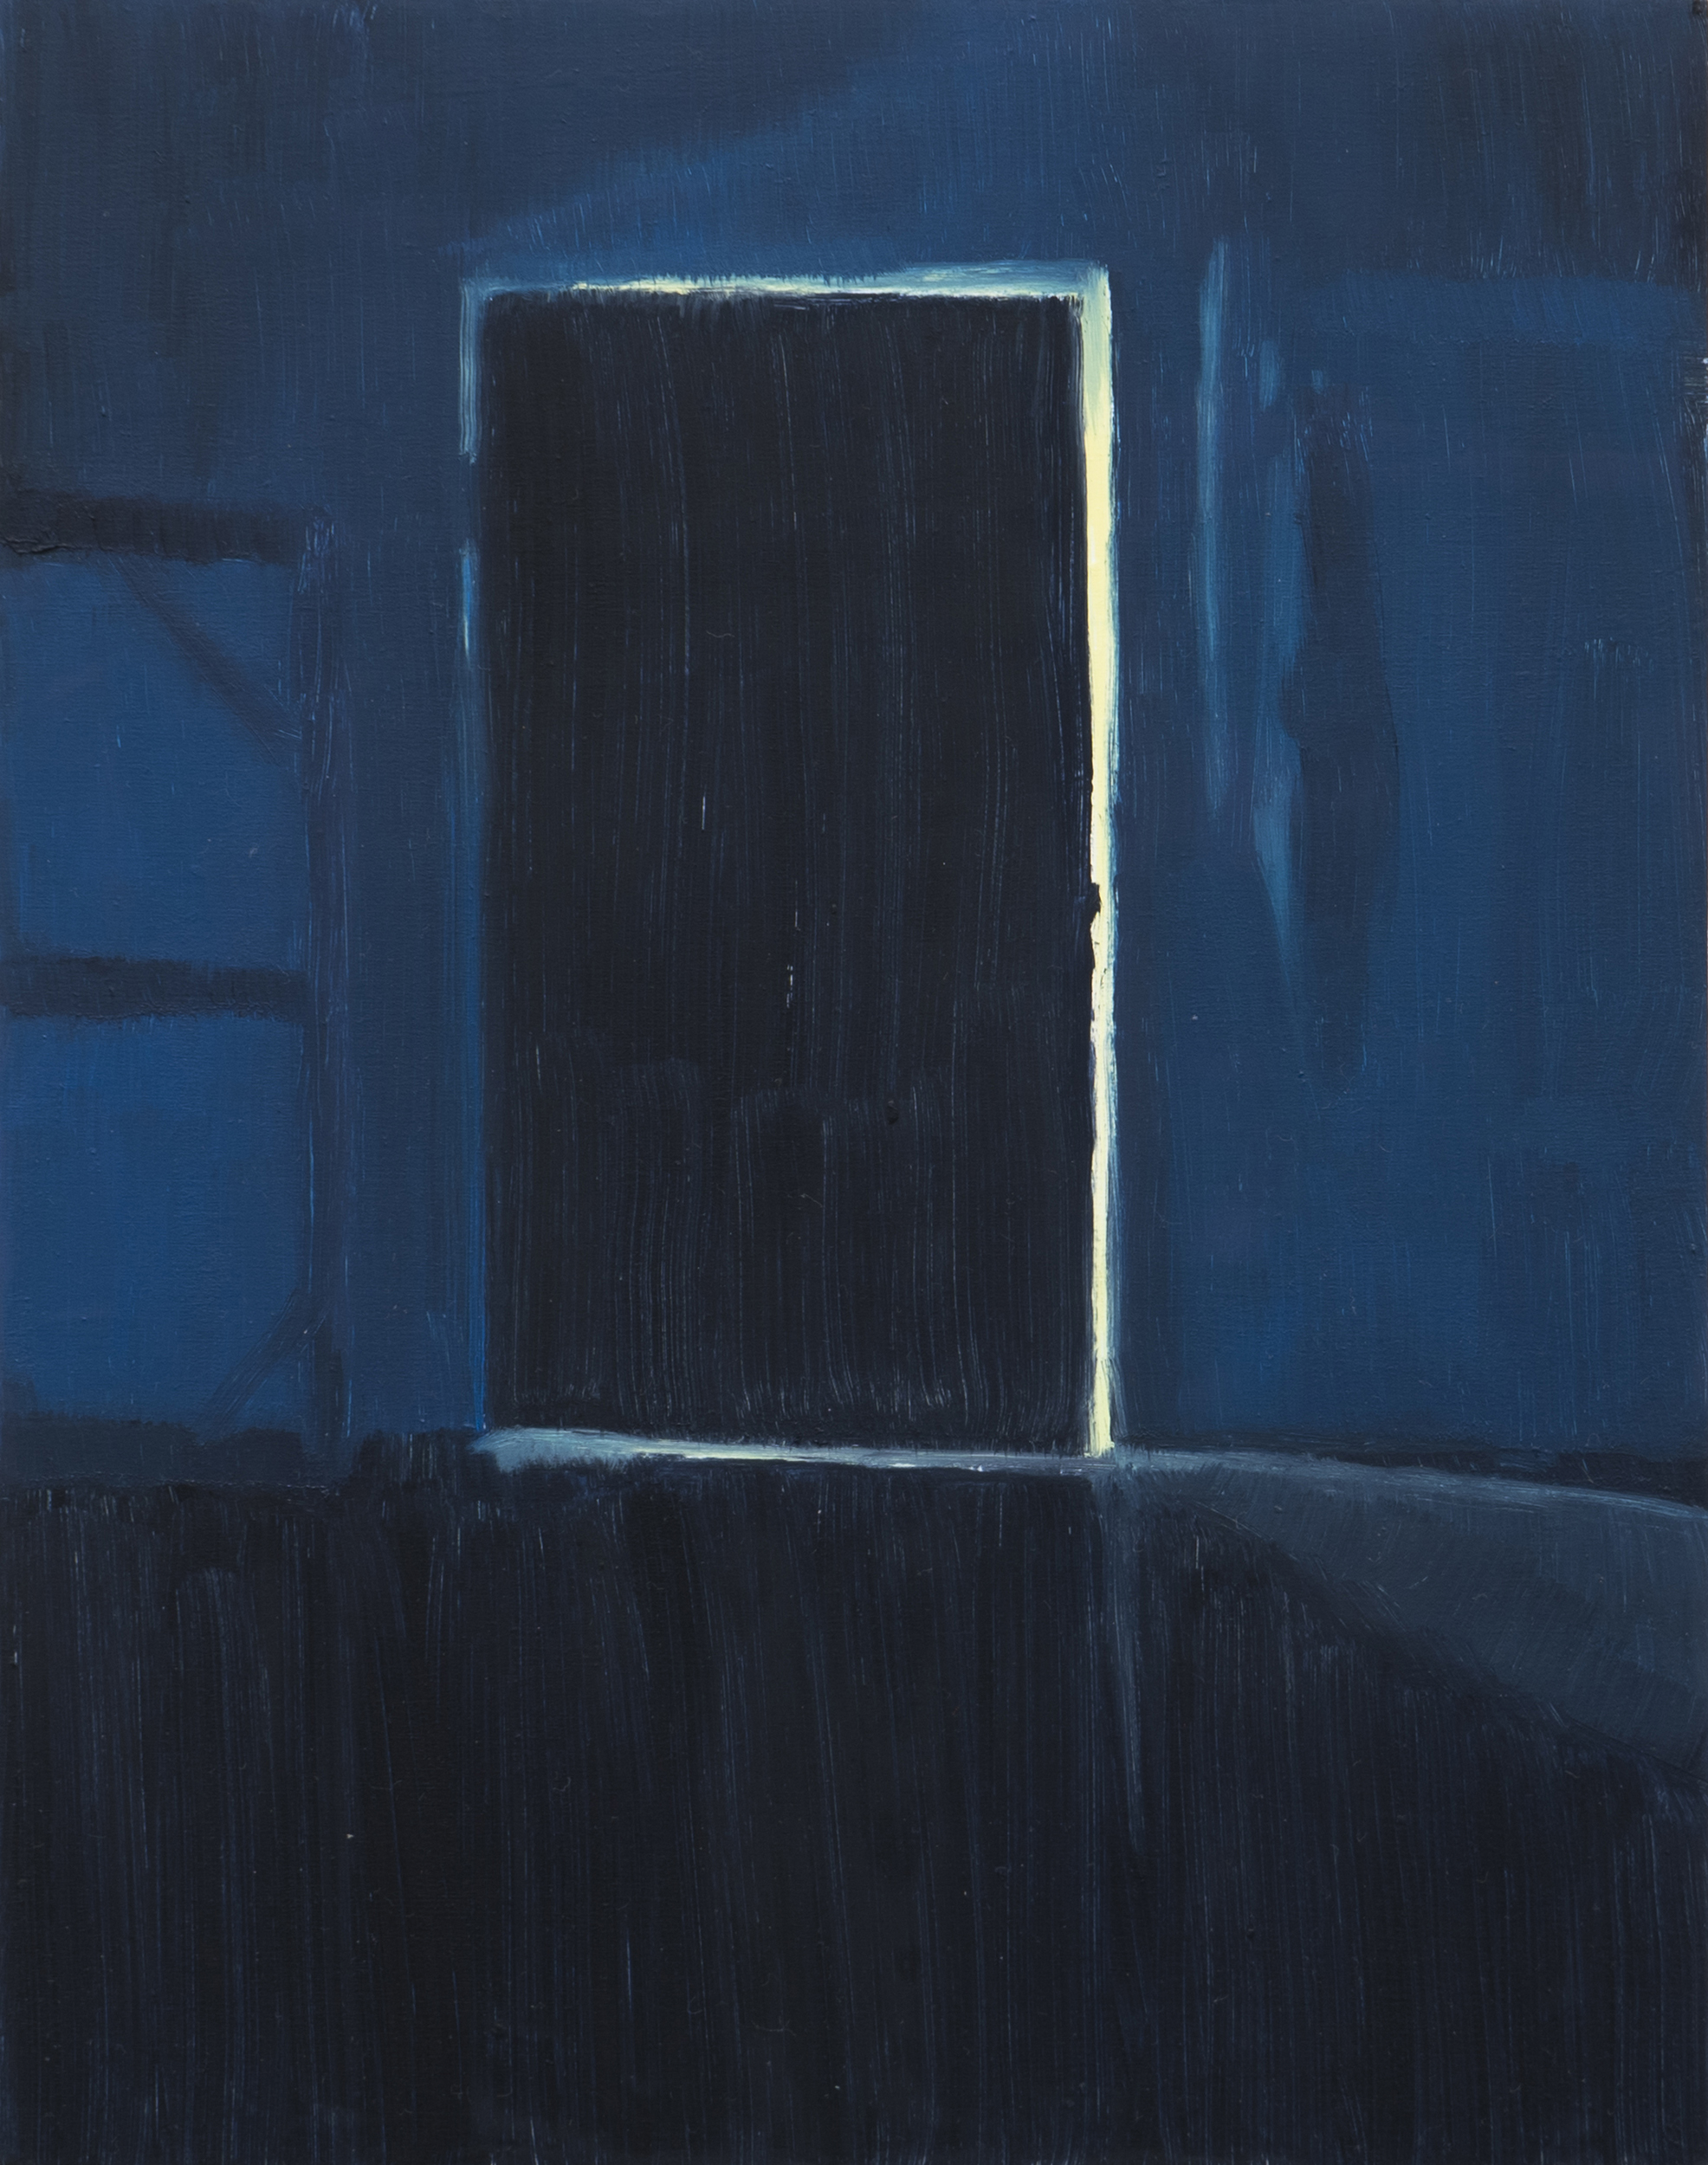 Yuri Yuan Blue Series: Door, 2021 oil on board 14 x 11 in. (35.6 x 27.9 cm.)